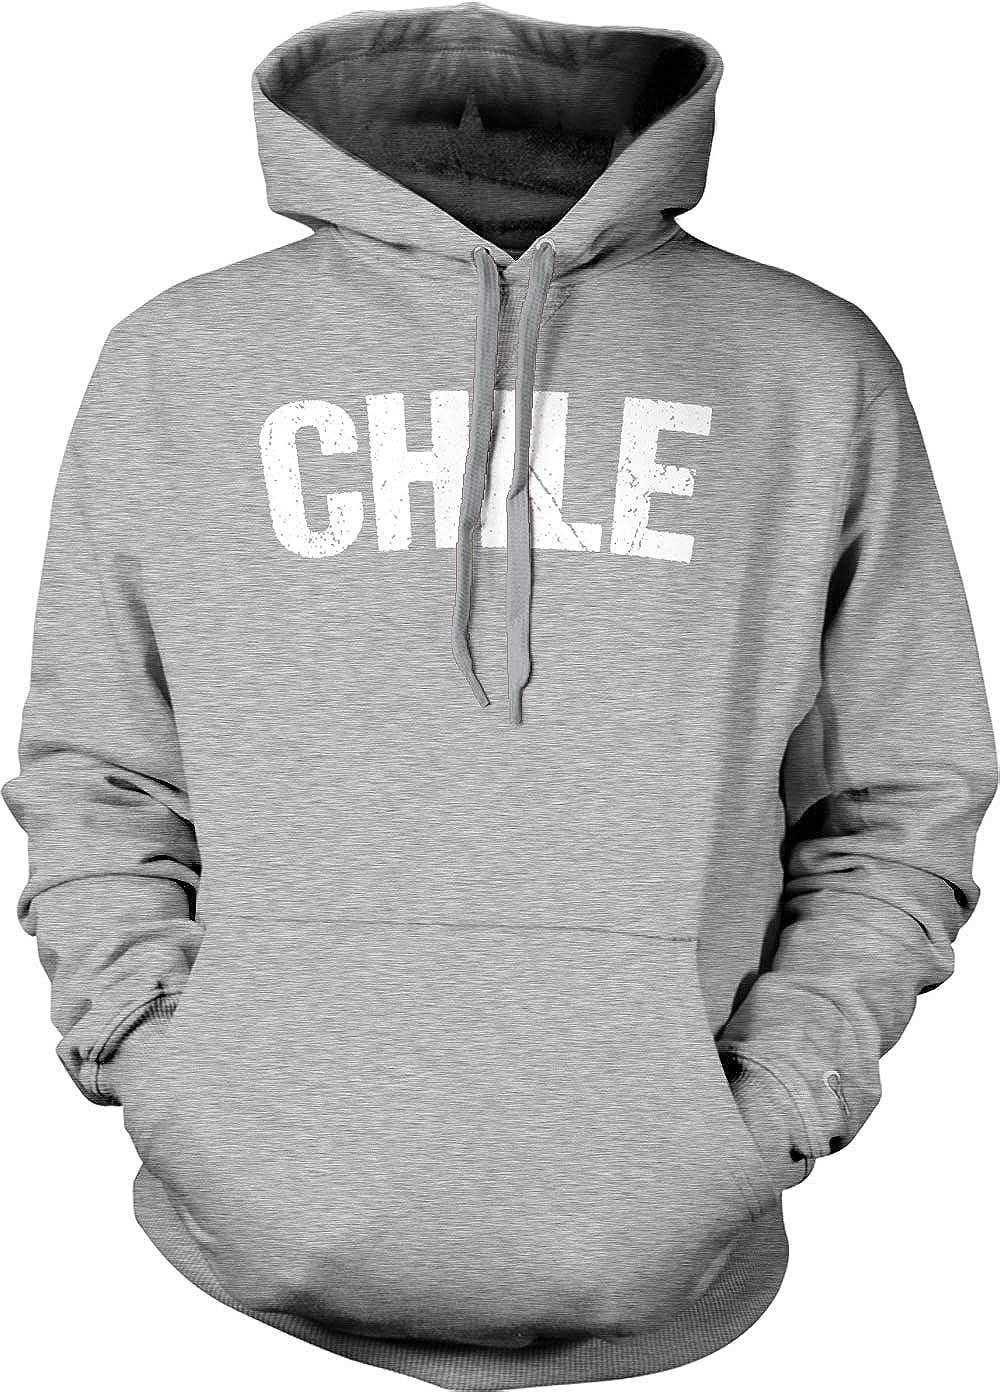 Tcombo Chile Soccer Futbol Sports Unisex Hoodie Sweatshirt